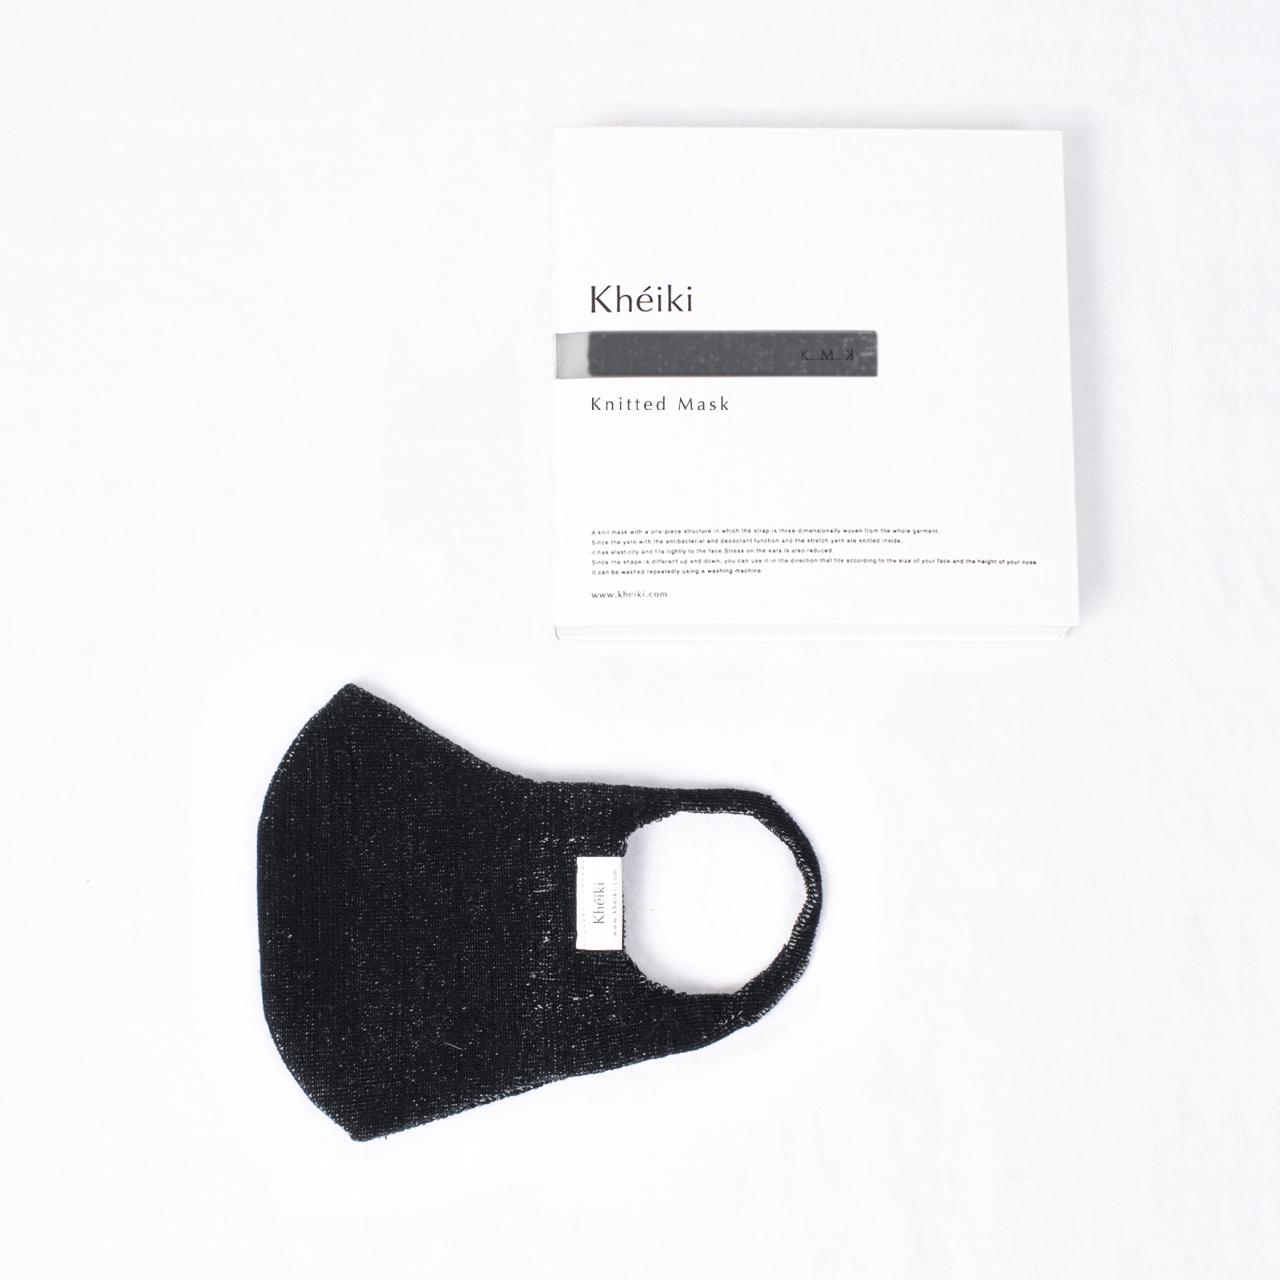 Knitted Mask 2pcs Set / KMK / Mercerized Long Staple Cotton / #Snow Black